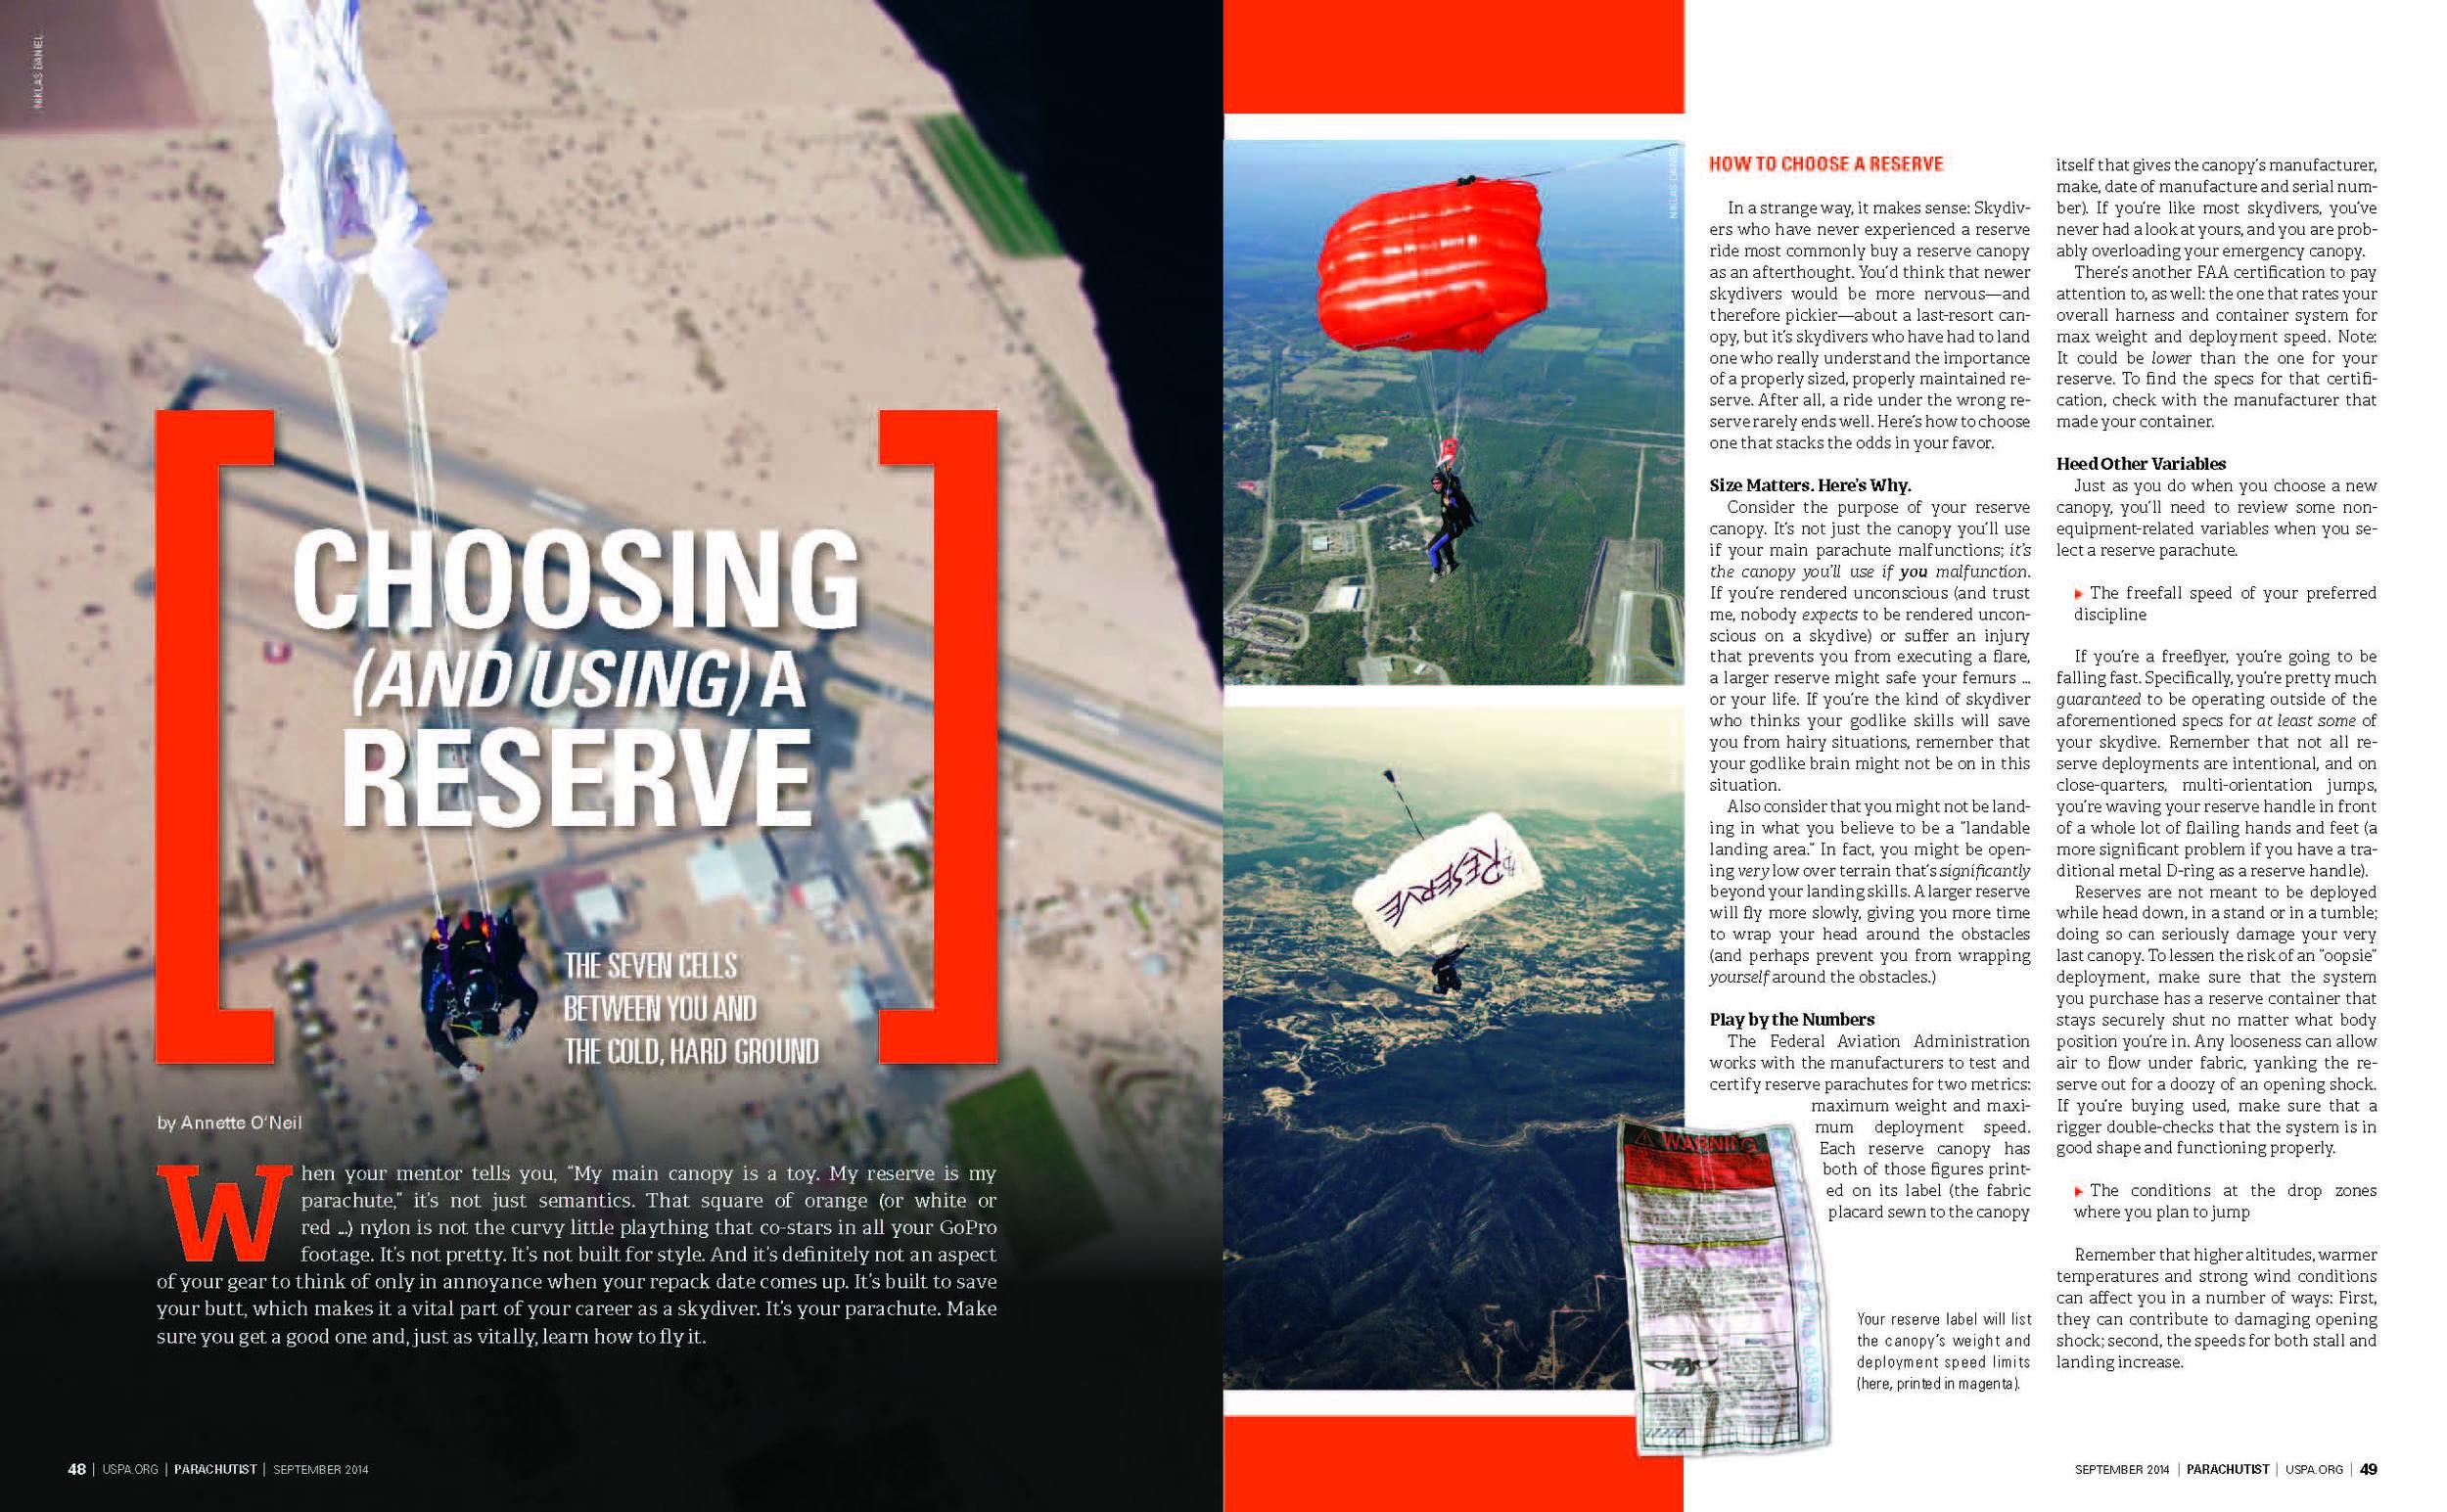 Choosing a Reserve-USPA-0914.jpg